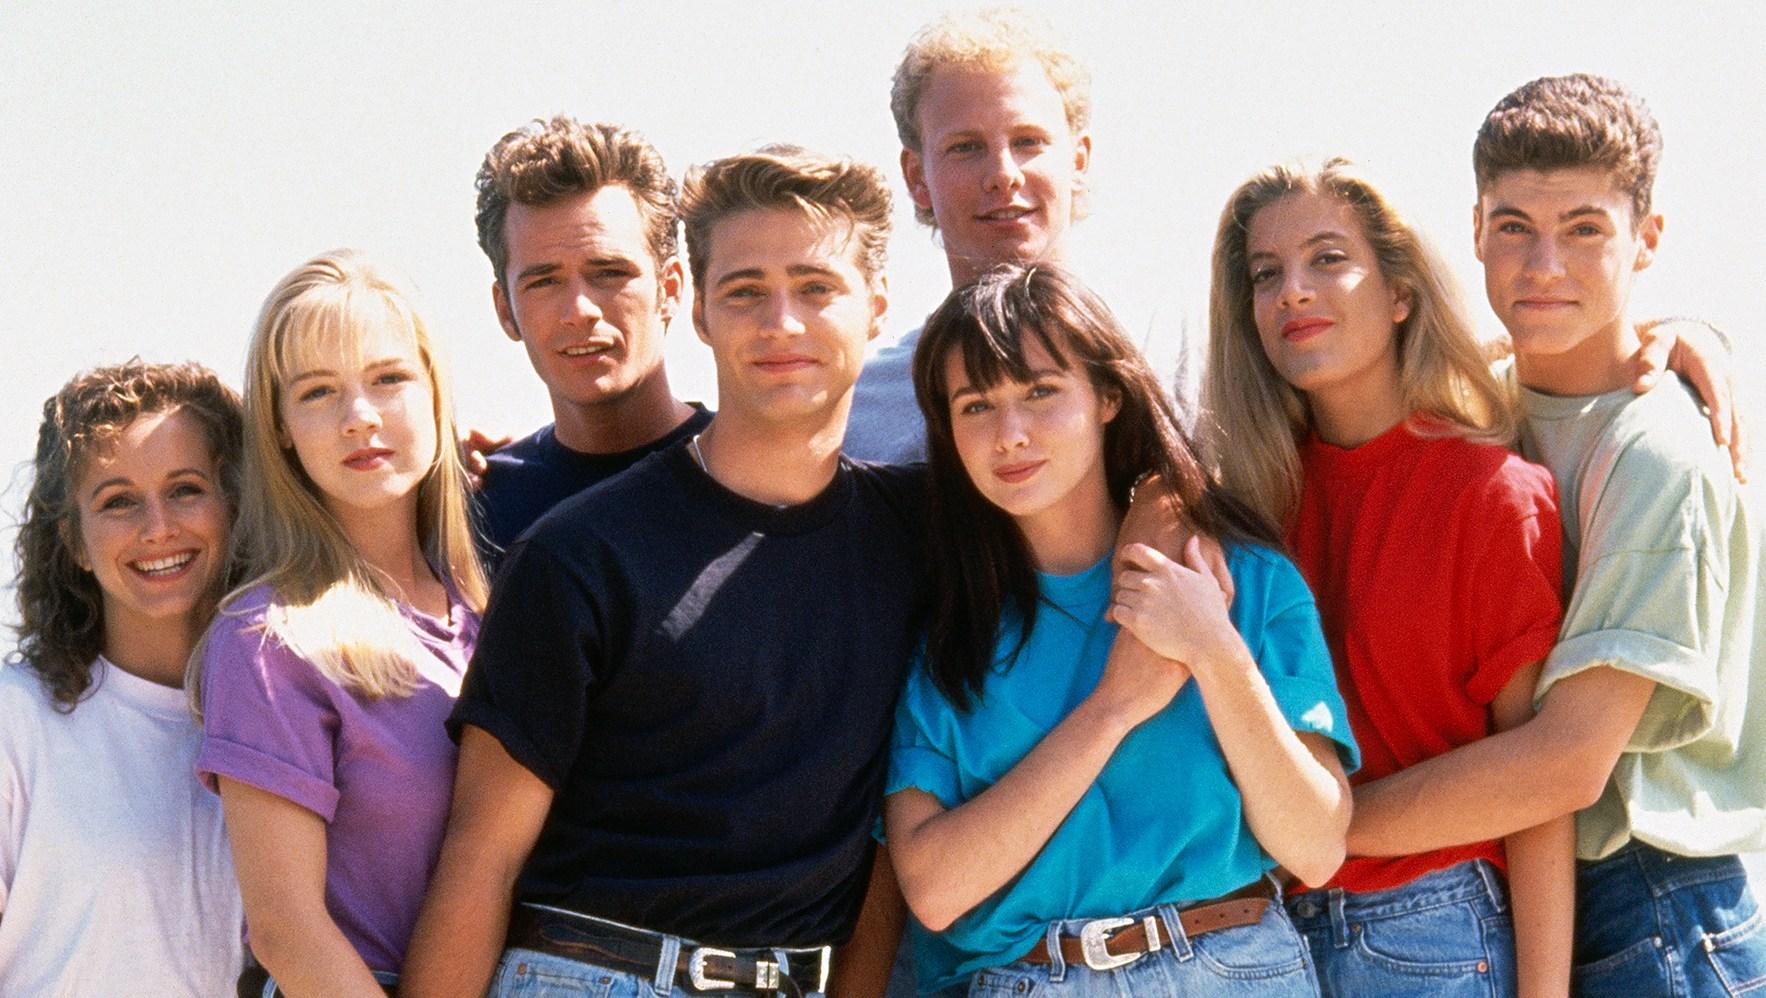 Beverly Hills 90210 Reboot Alienated Original Writers